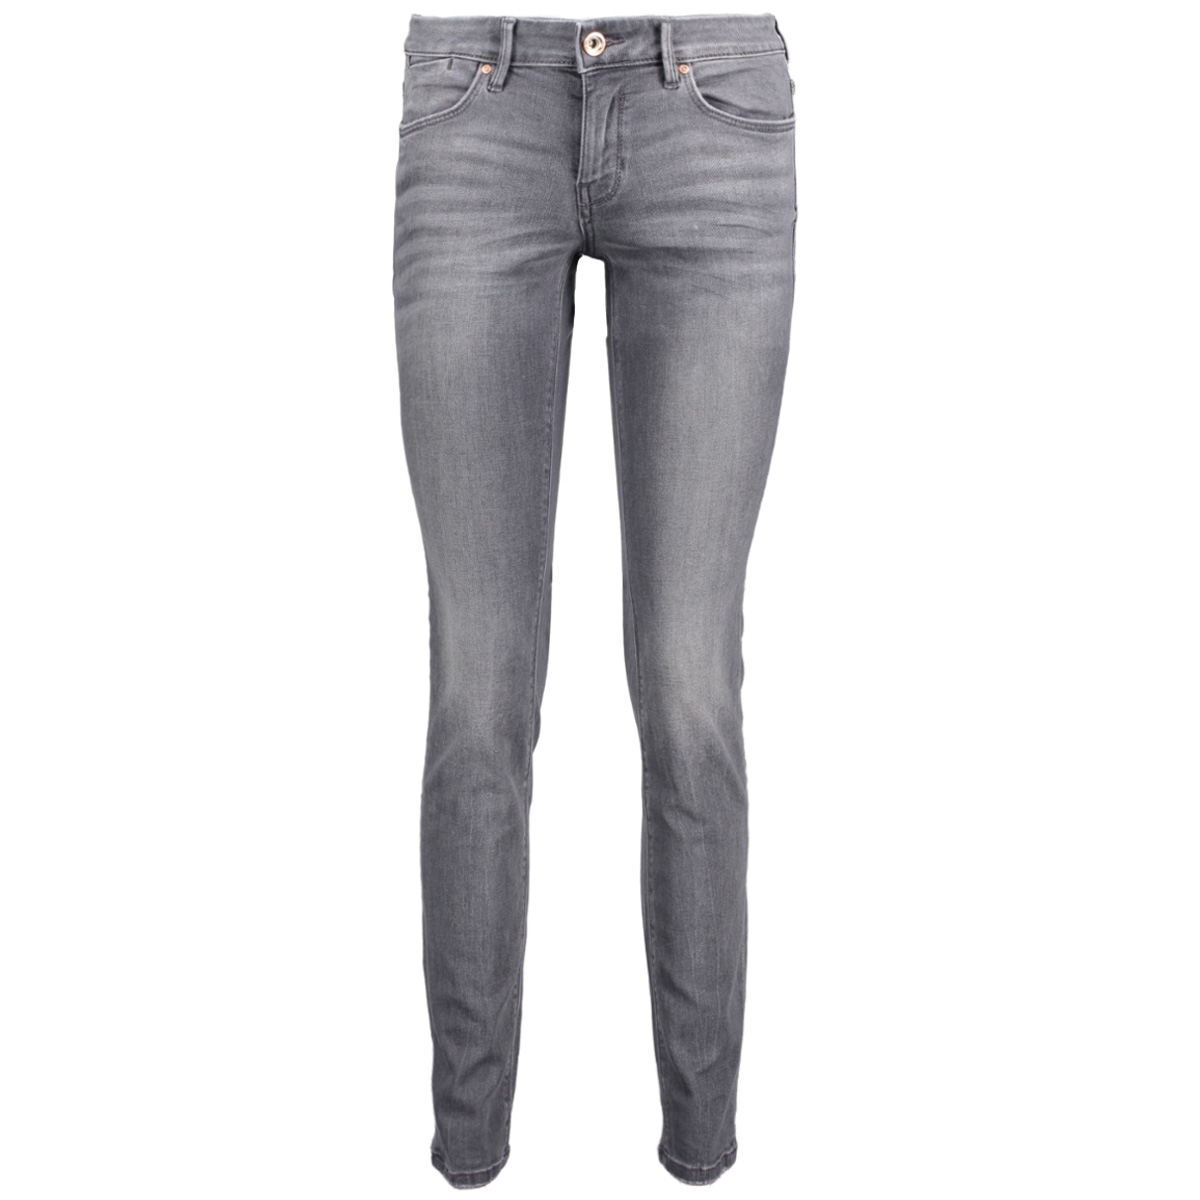 62554800970 tom tailor jeans 1058